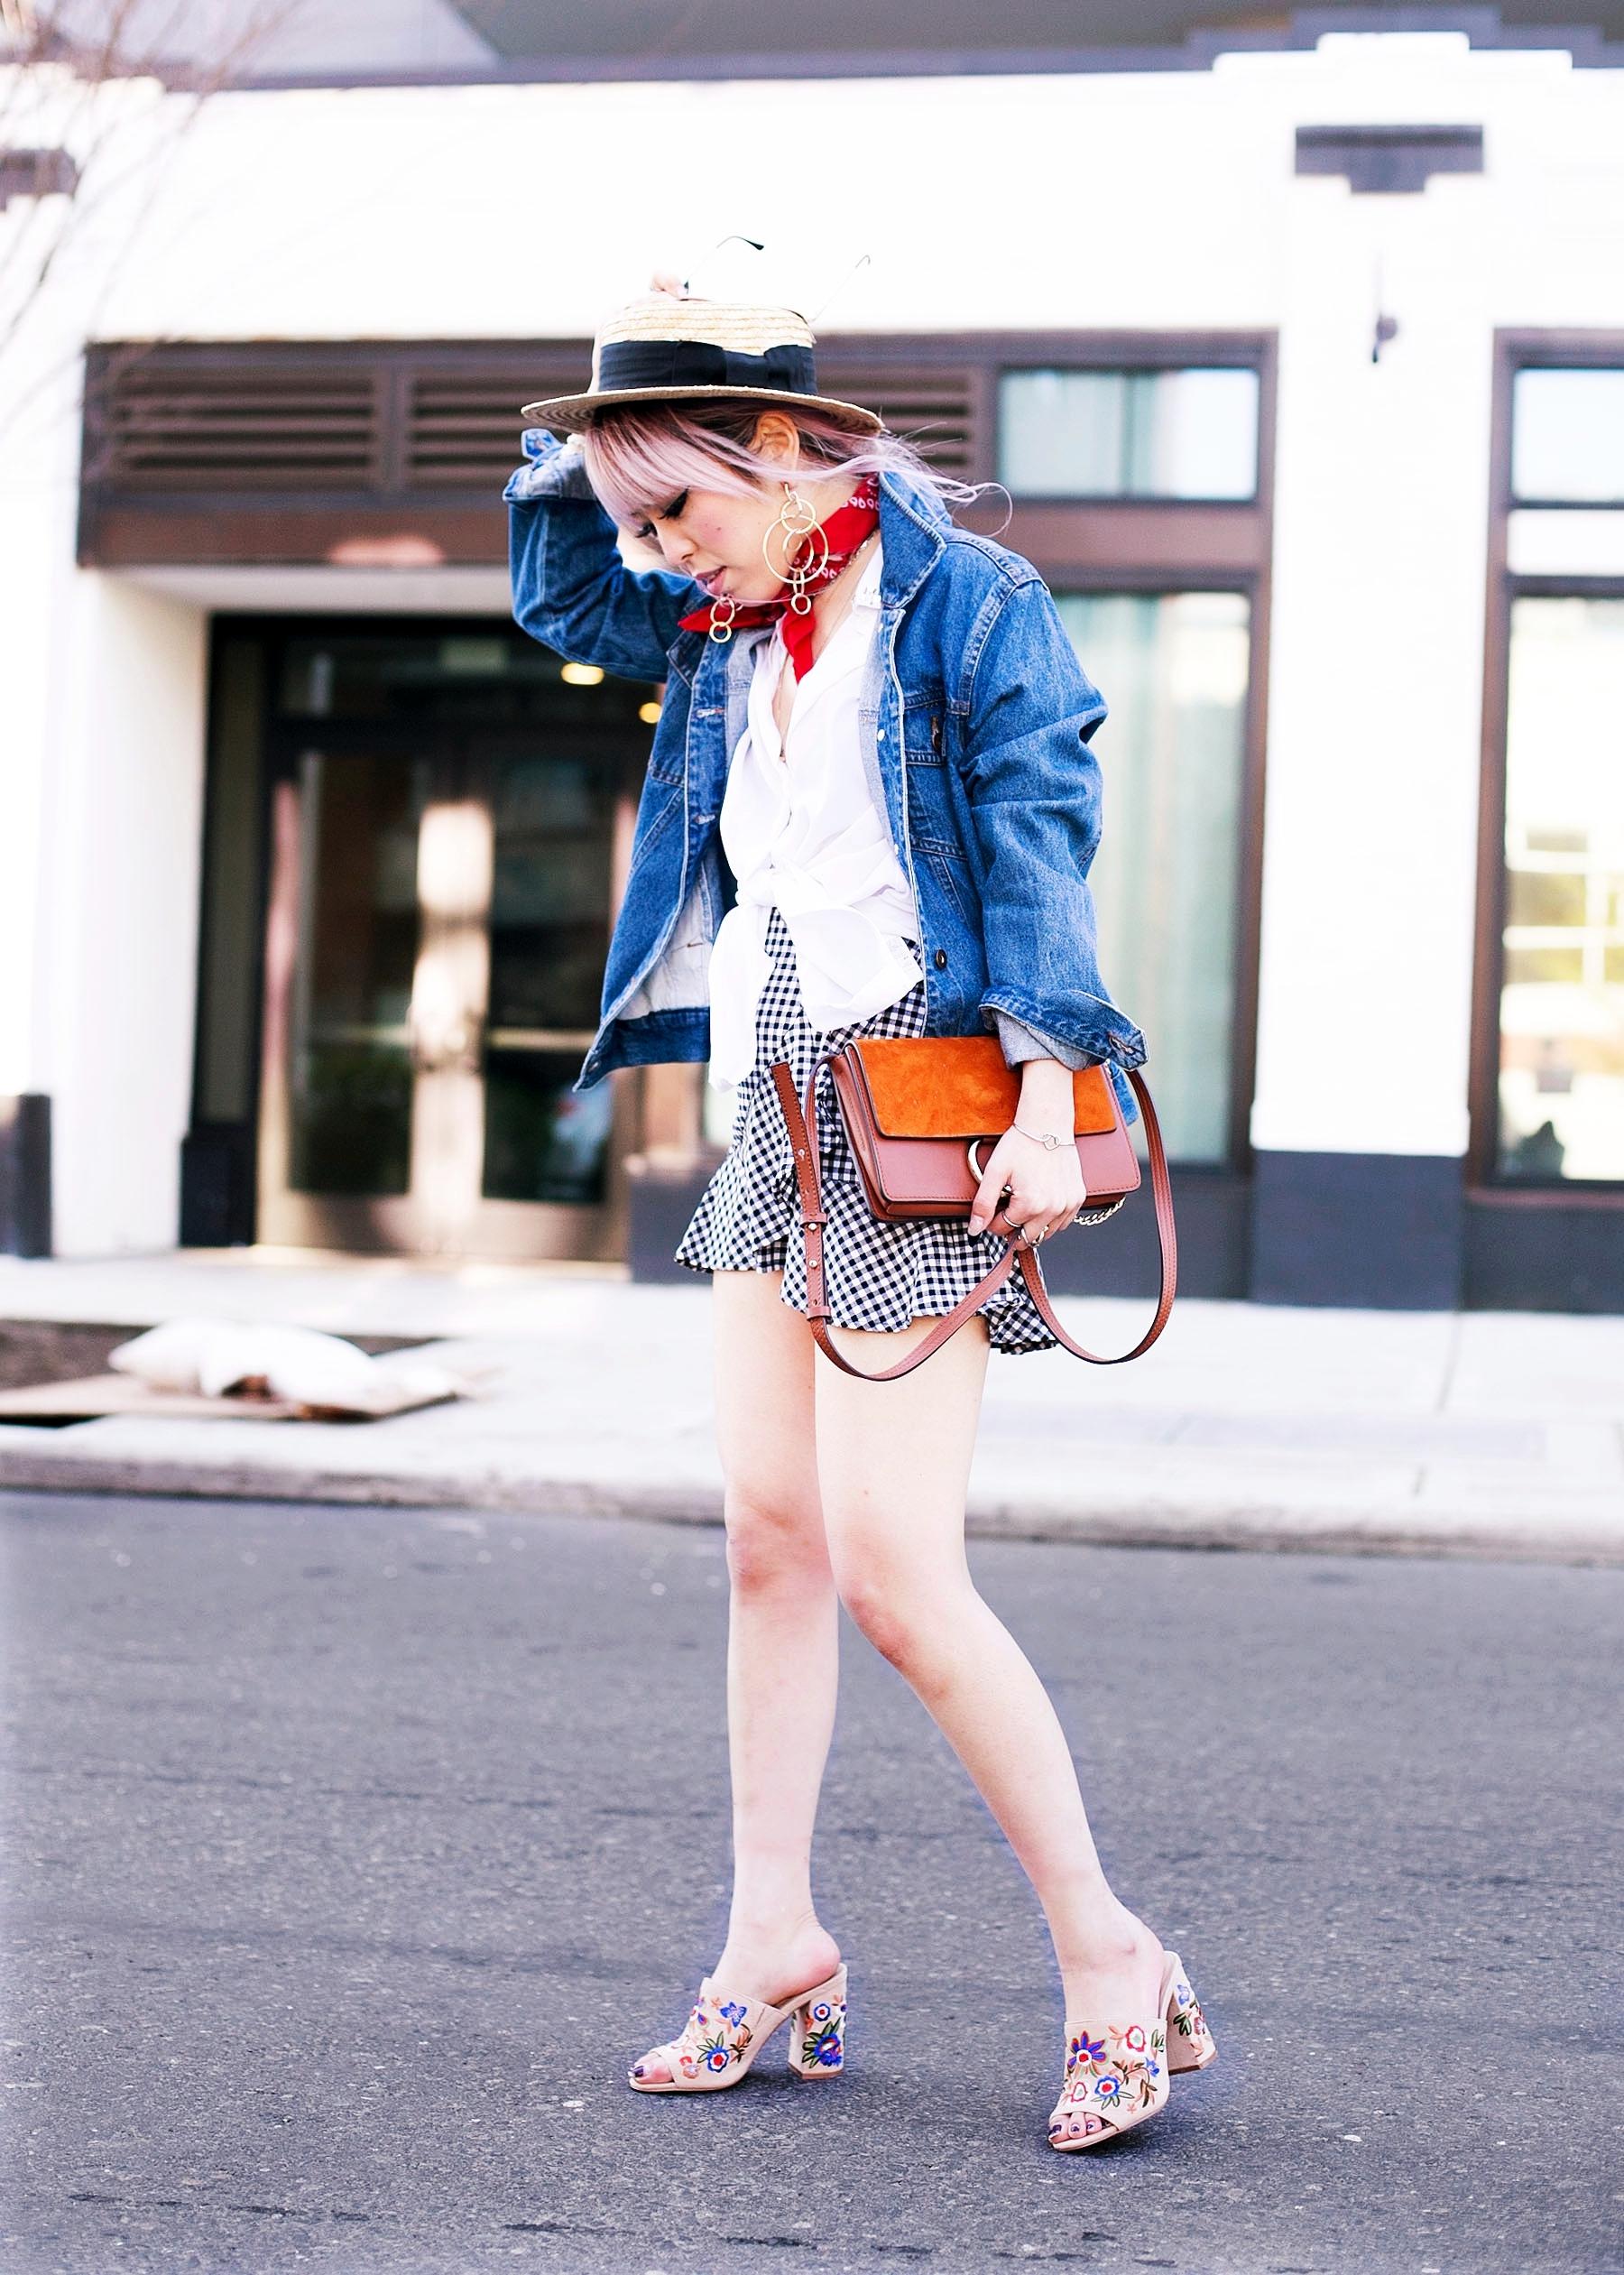 H&M Straw hat_Urban Outfitter Red bandana_kohls kohl's button up shirts_ZARA statement earrings_H&M gingham mini skirt_Chloe bag_ALDO Embroidered Mules_Aikas Love Closet_Seattle Fashion style logger_petite fashion